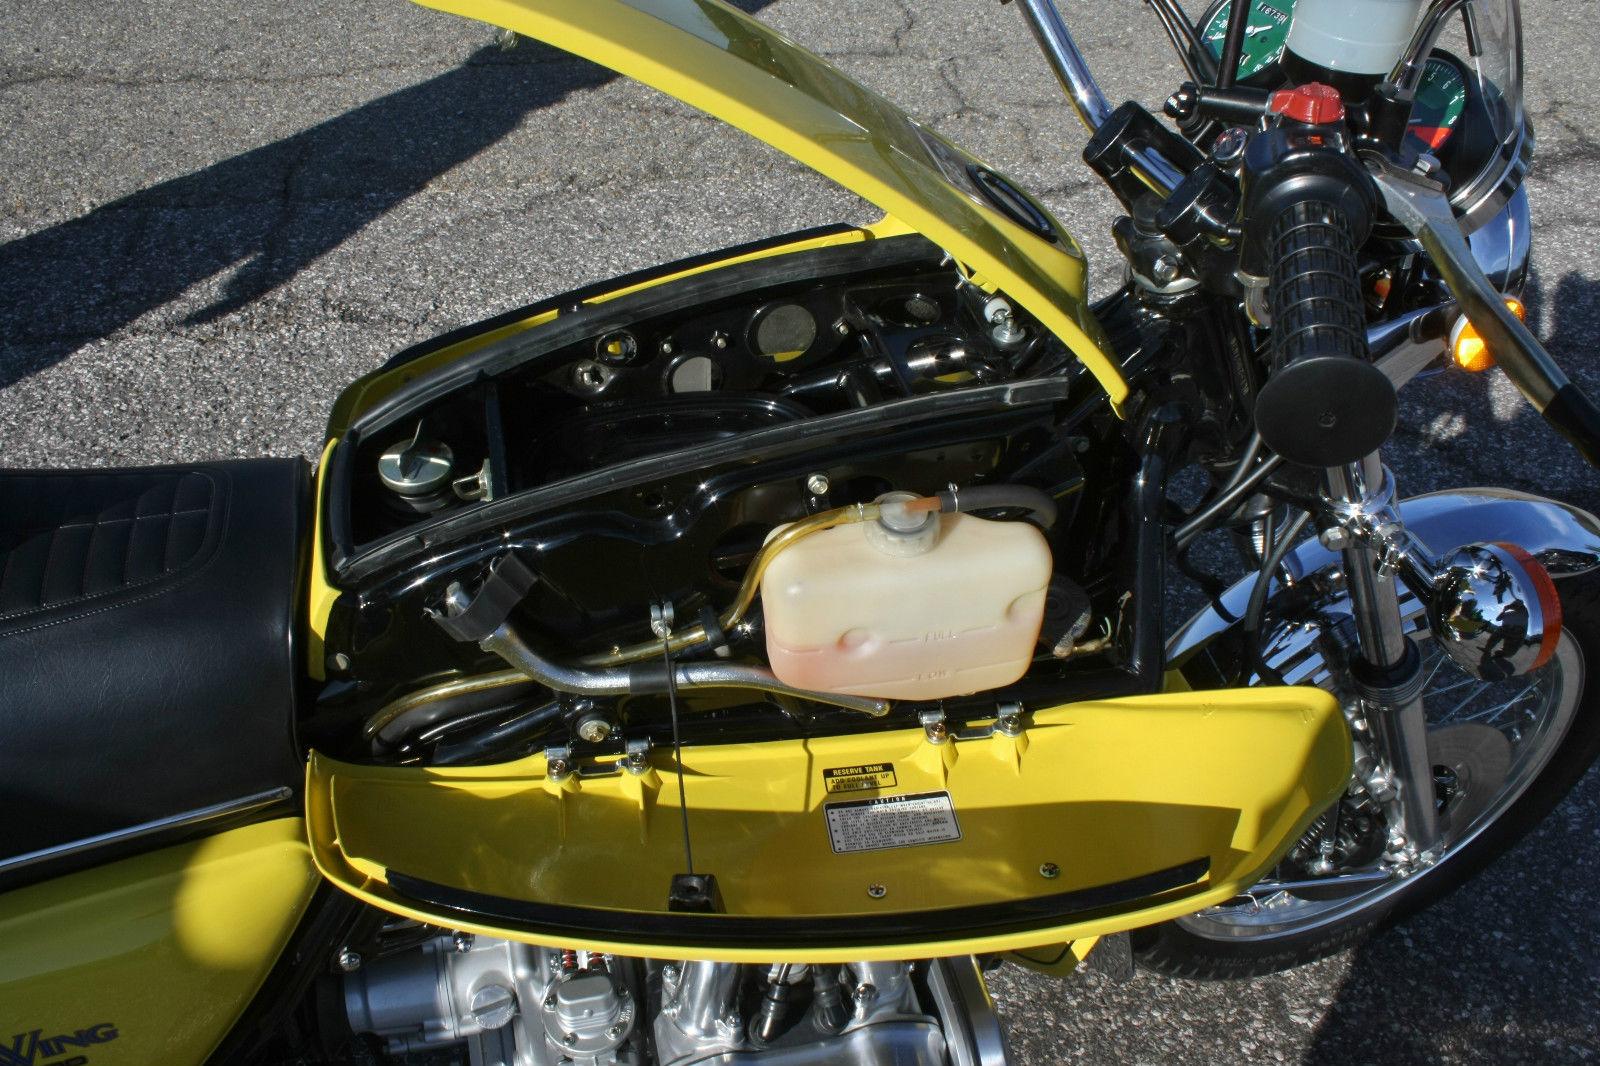 suzuki wiring diagram motorcycle 2007 subaru impreza stereo restored honda goldwing gl1000 - 1976 photographs at classic bikes |bikes